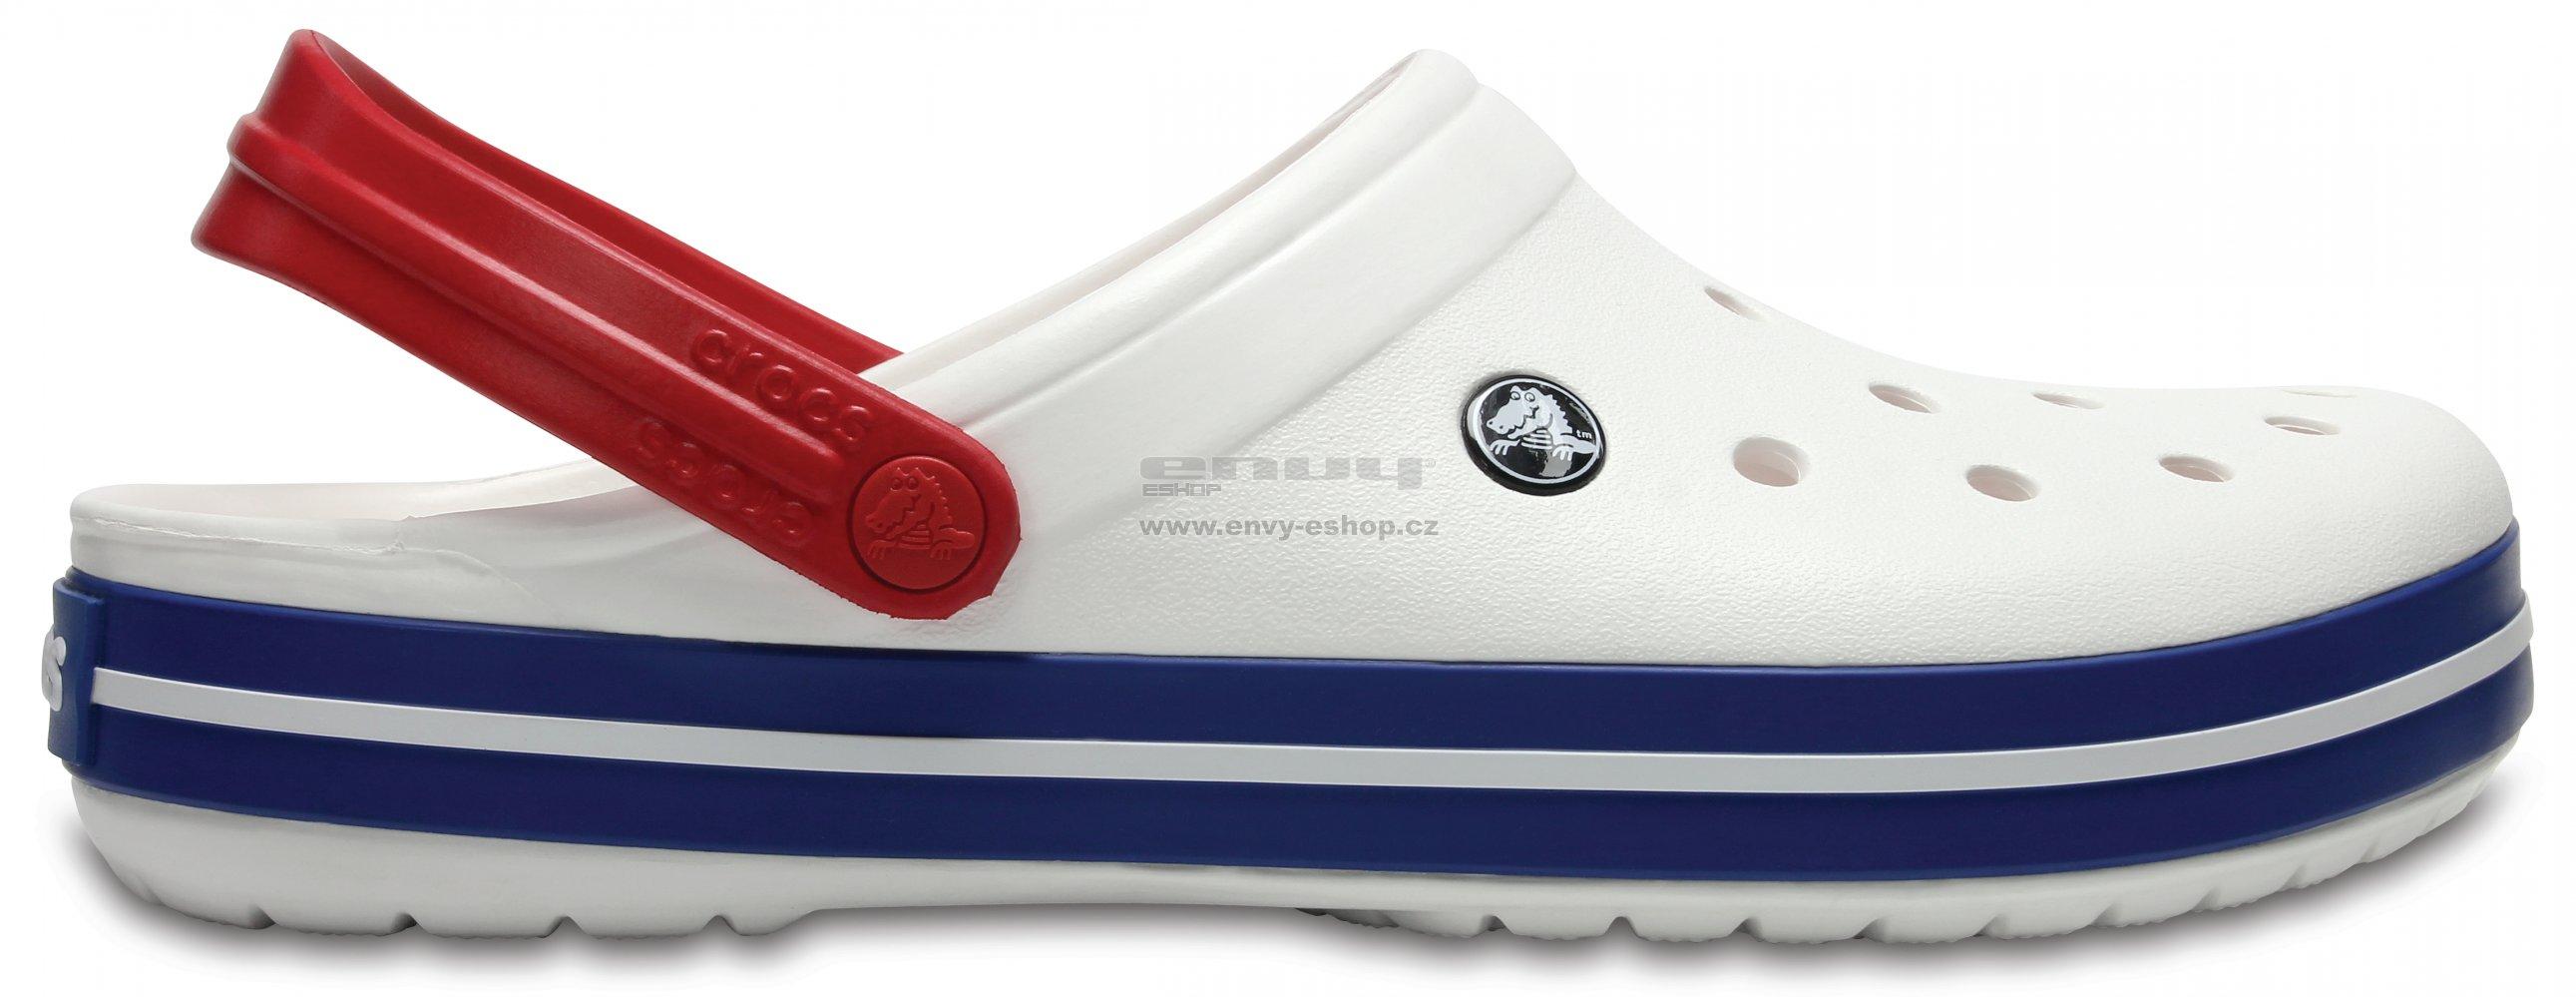 259916008dc Pánské pantofle CROCS CROCBAND CLOG 11016-11I WHITE BLUE JEAN ...